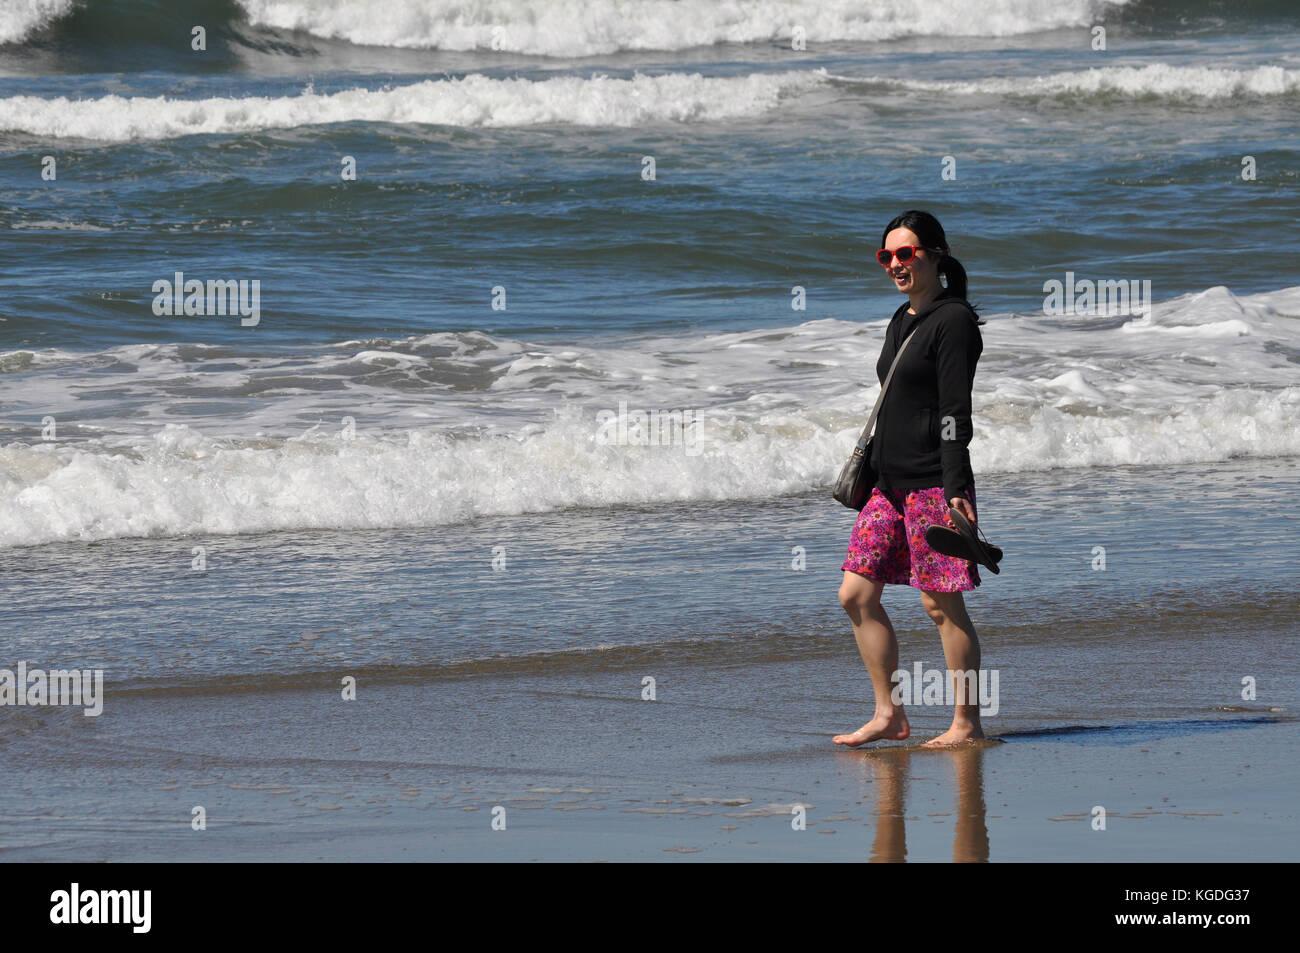 artist, Michelle Wong Clay walking on Ocean Beach in San Francisco, California - Stock Image